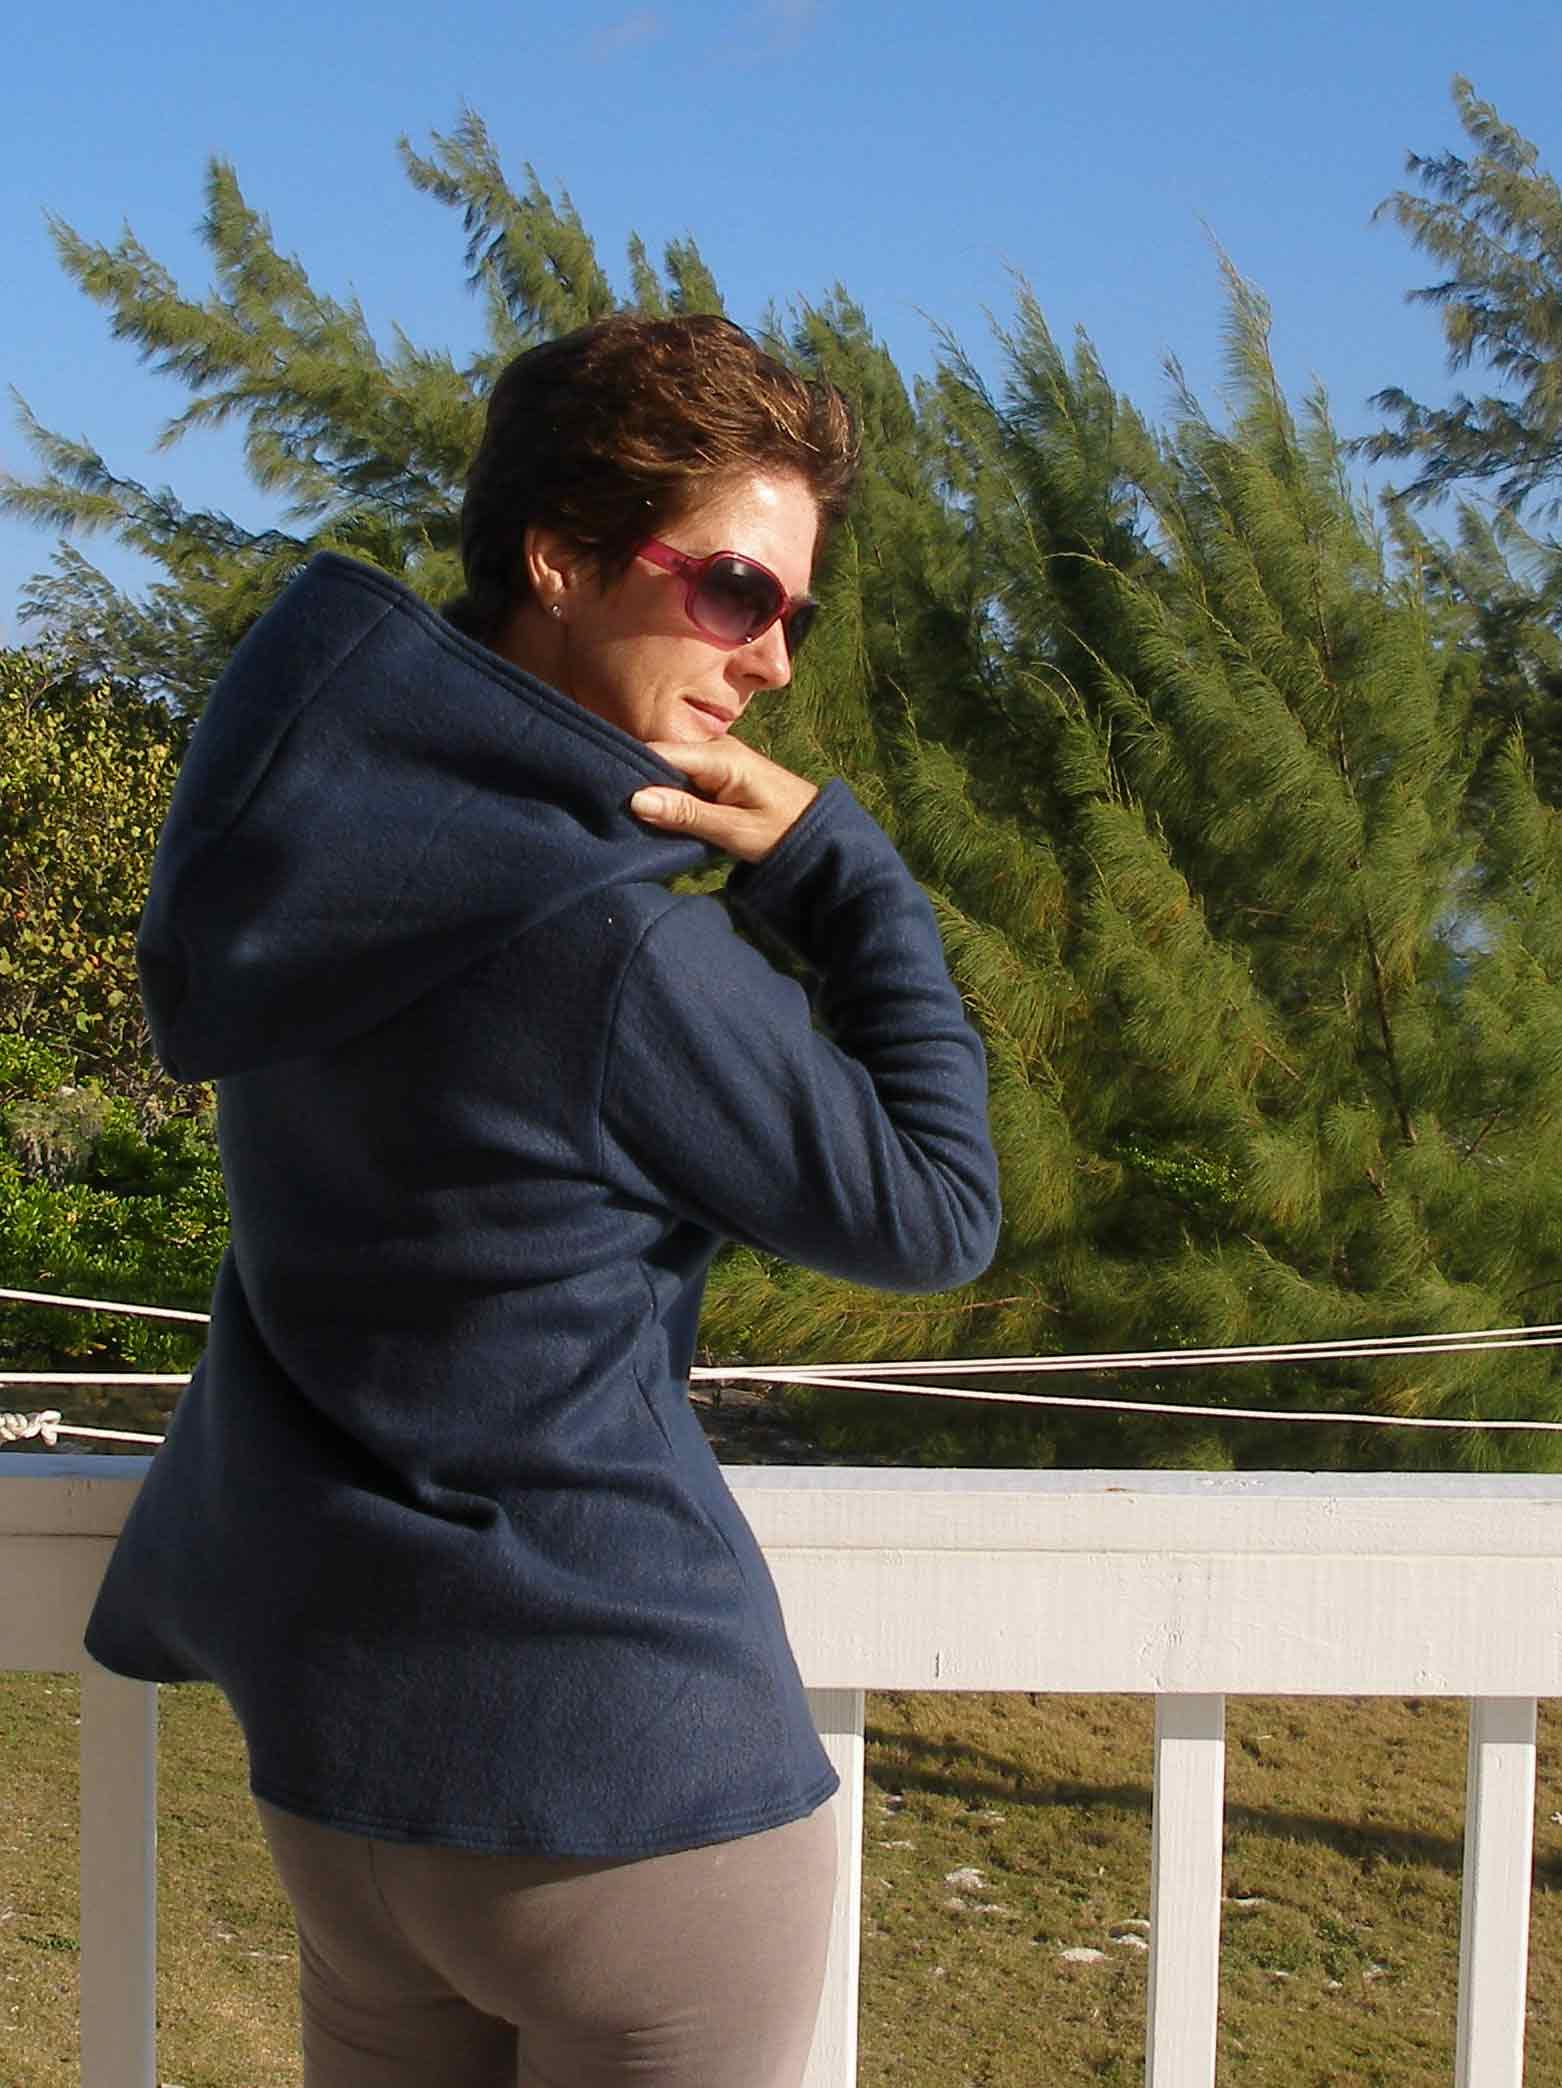 Fleece hoodie !  Why?